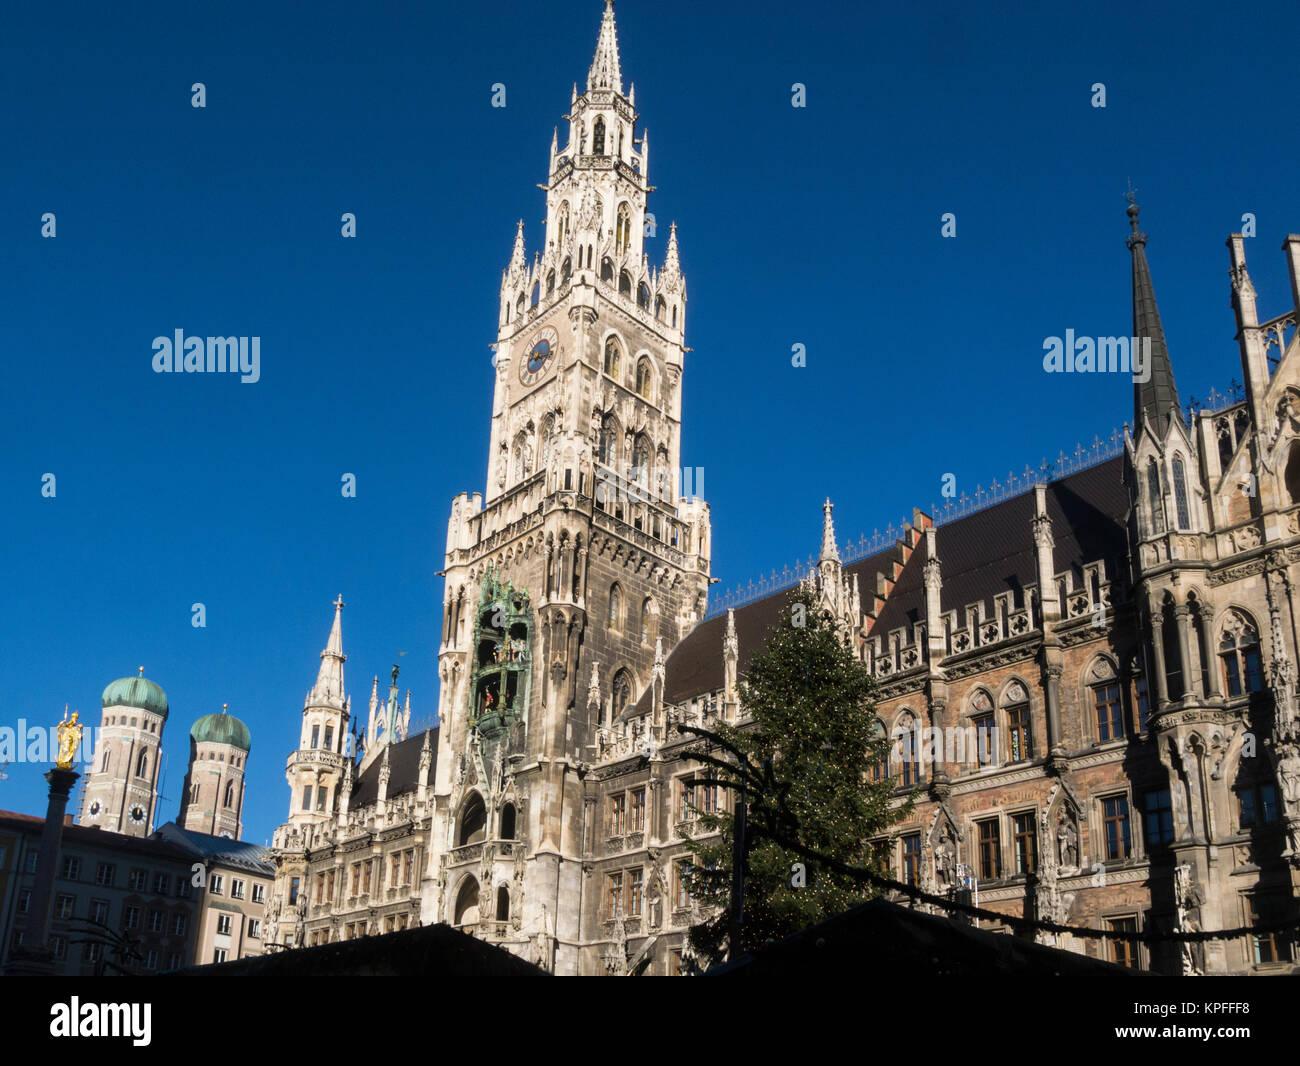 Magnificent Rathaus New Town Hall building and spires of Frauenkirche Marienplatz Munich Bavaria Germany EU - Stock Image